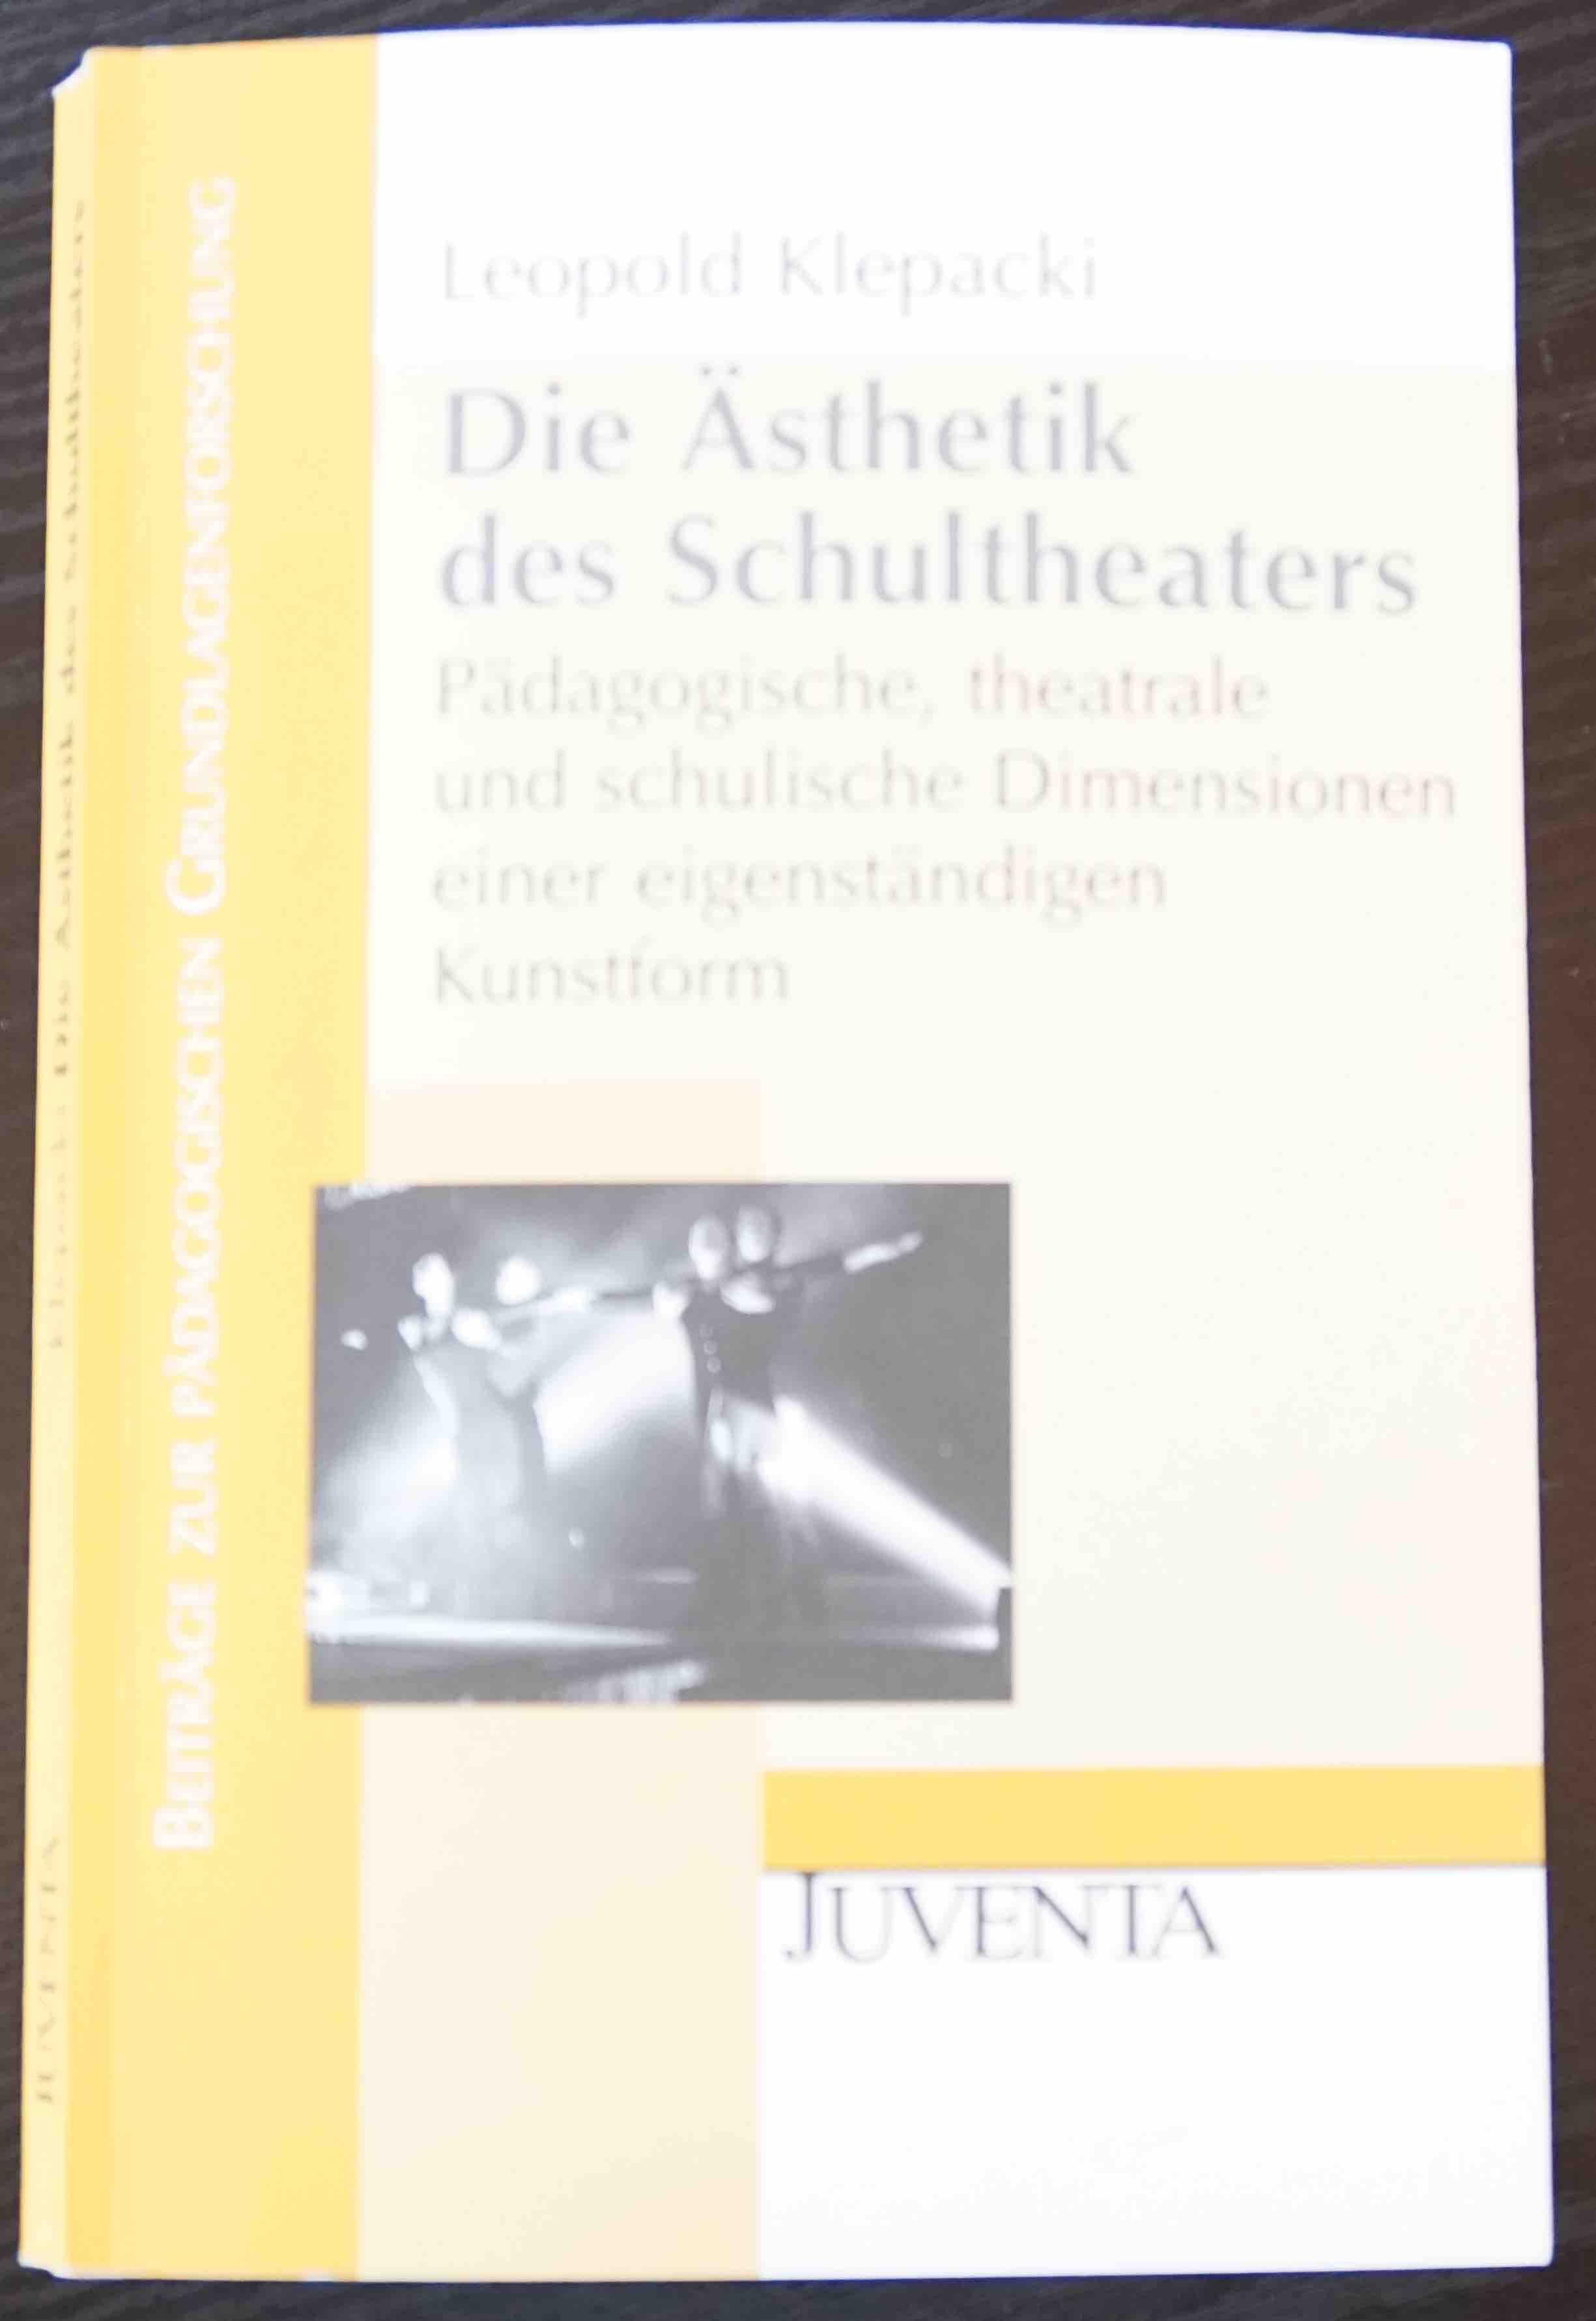 Klepacki (2007): Die Ästhetik des Schultheaters